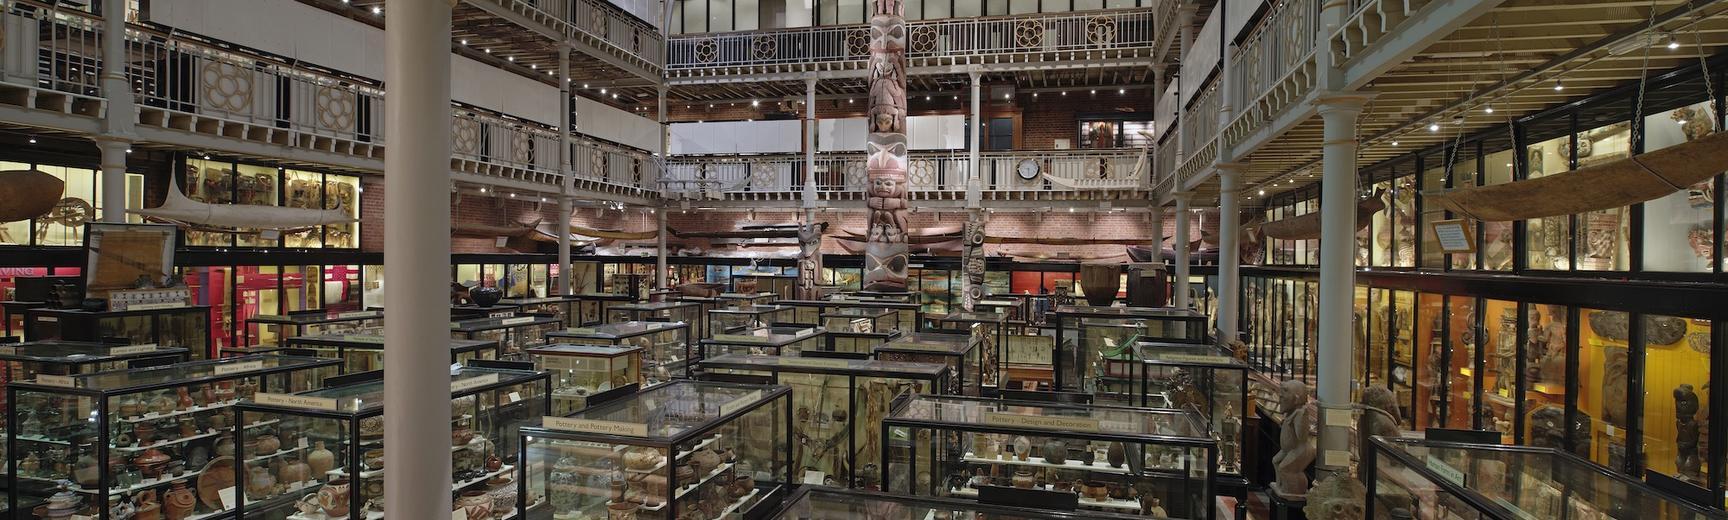 copyright pitt rivers museum university of oxford 2013 17 1